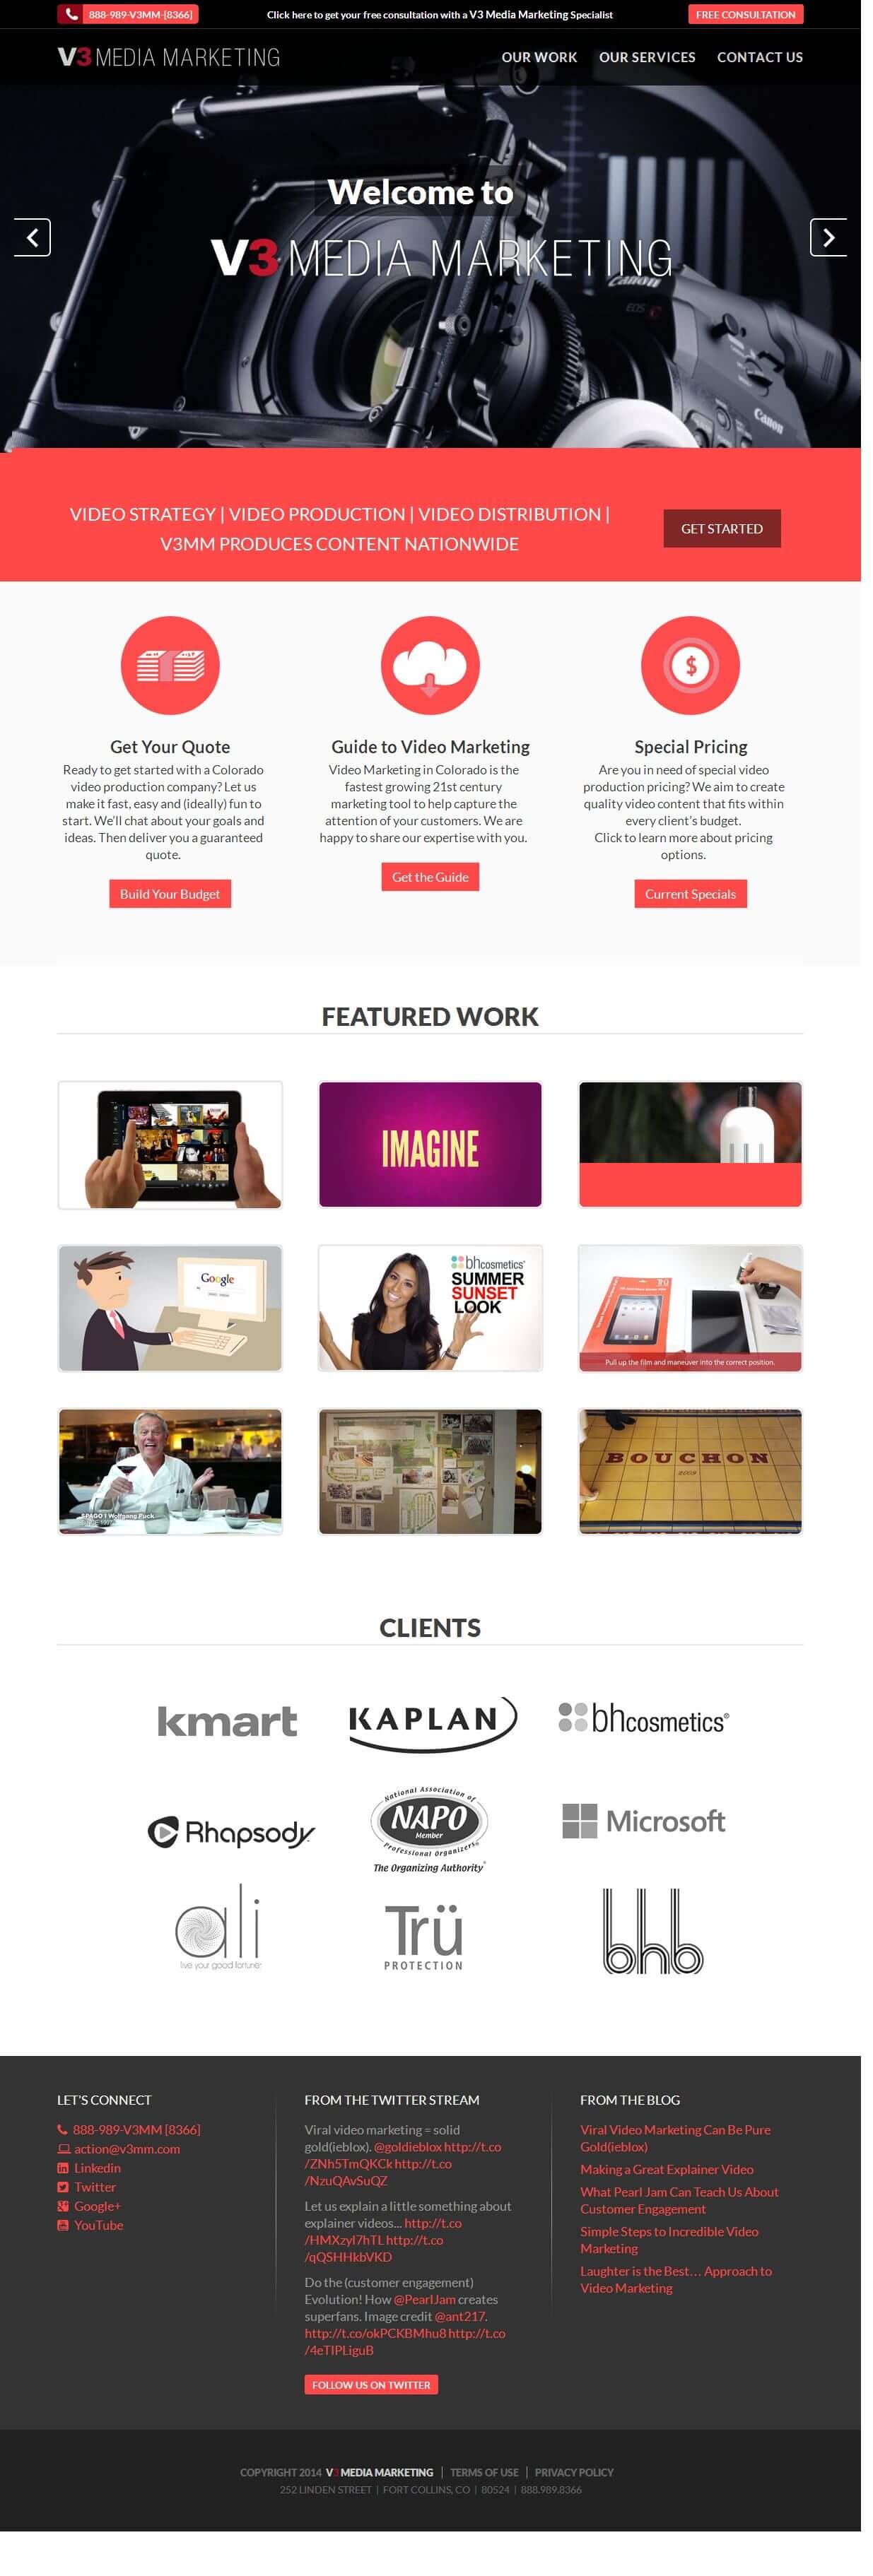 Maintenance of WordPress Powered Media Marketing Company Website